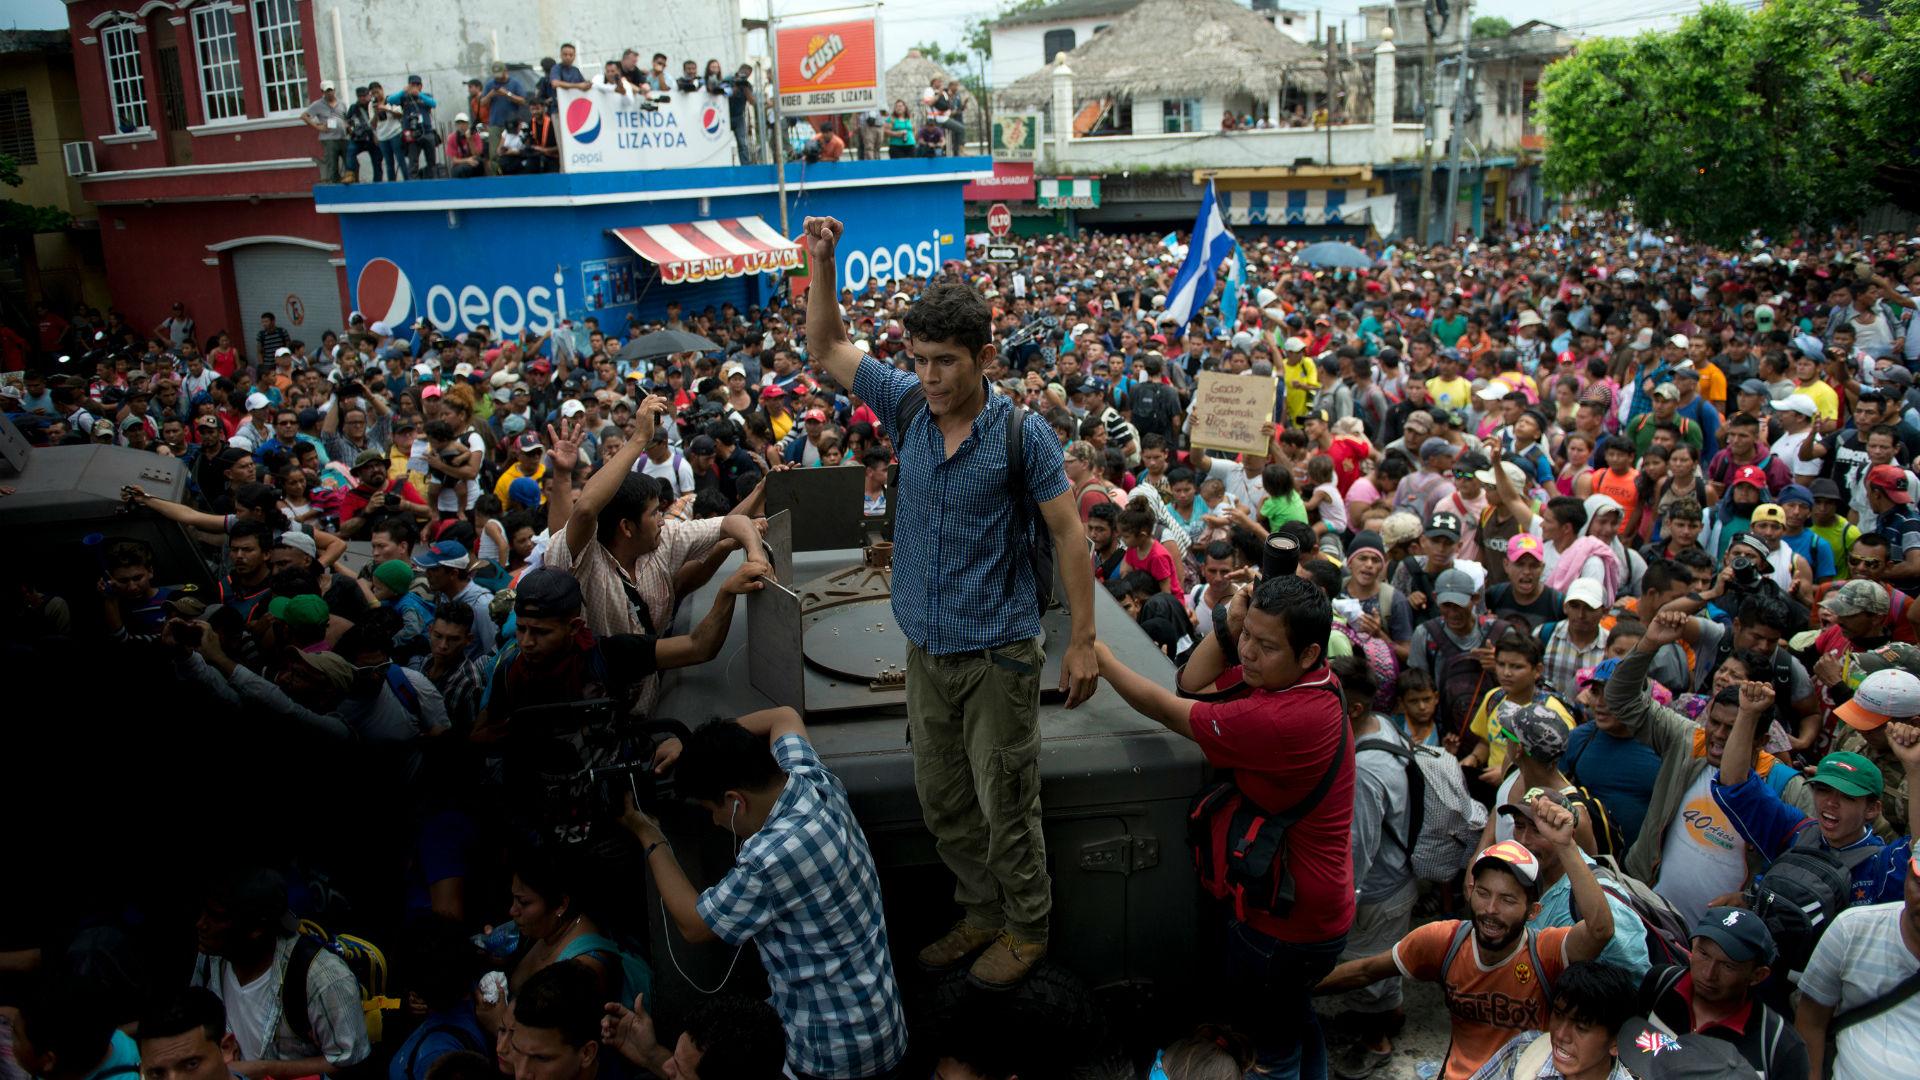 Caravan Crisis – Michael Cutler